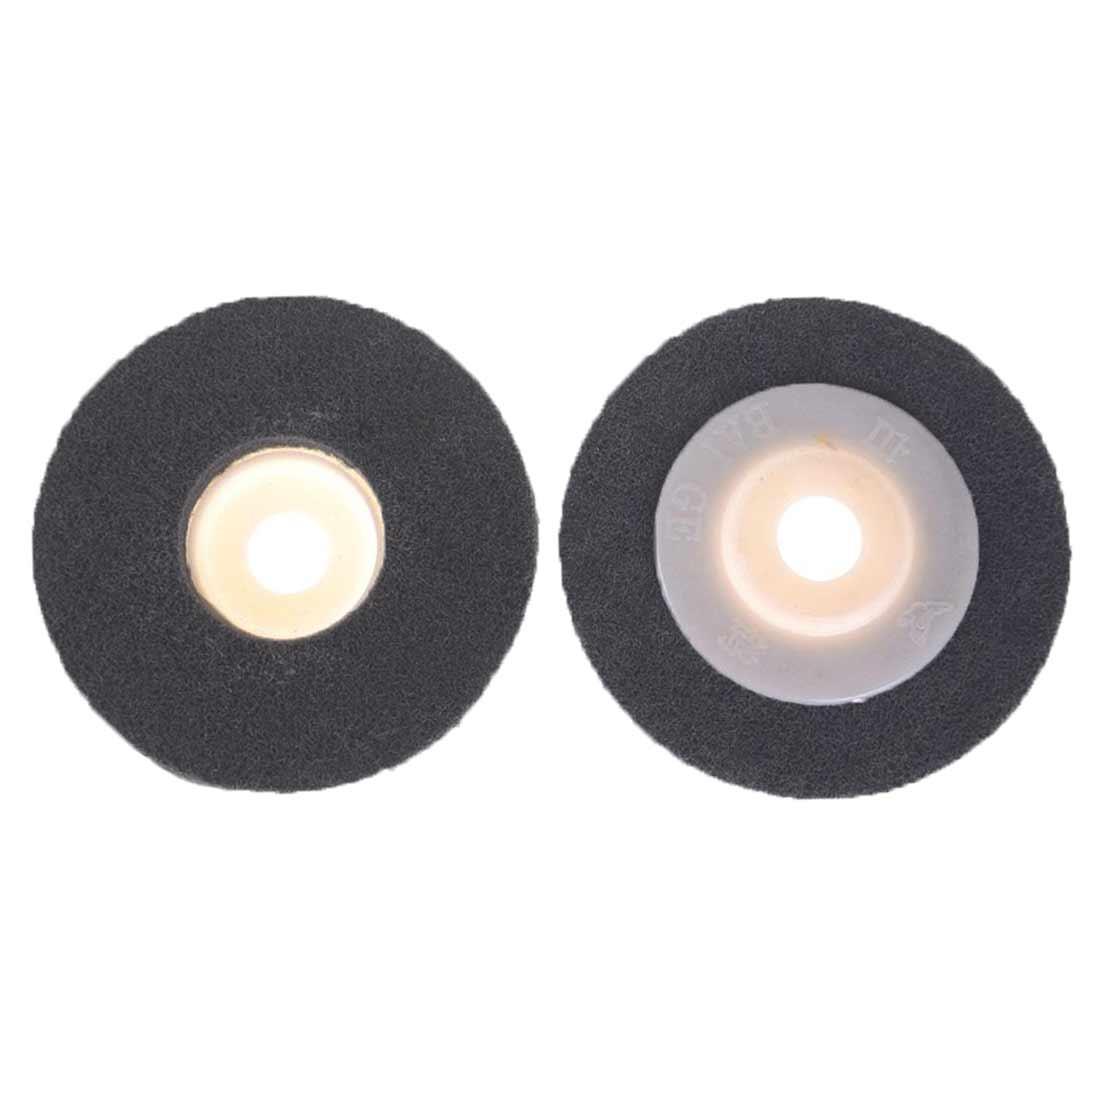 Polishing 180# Non-woven Unitized Polishing Wheel  Nylon Grinding Disc For Soft Metal Stainless Steel 100*12*16mm